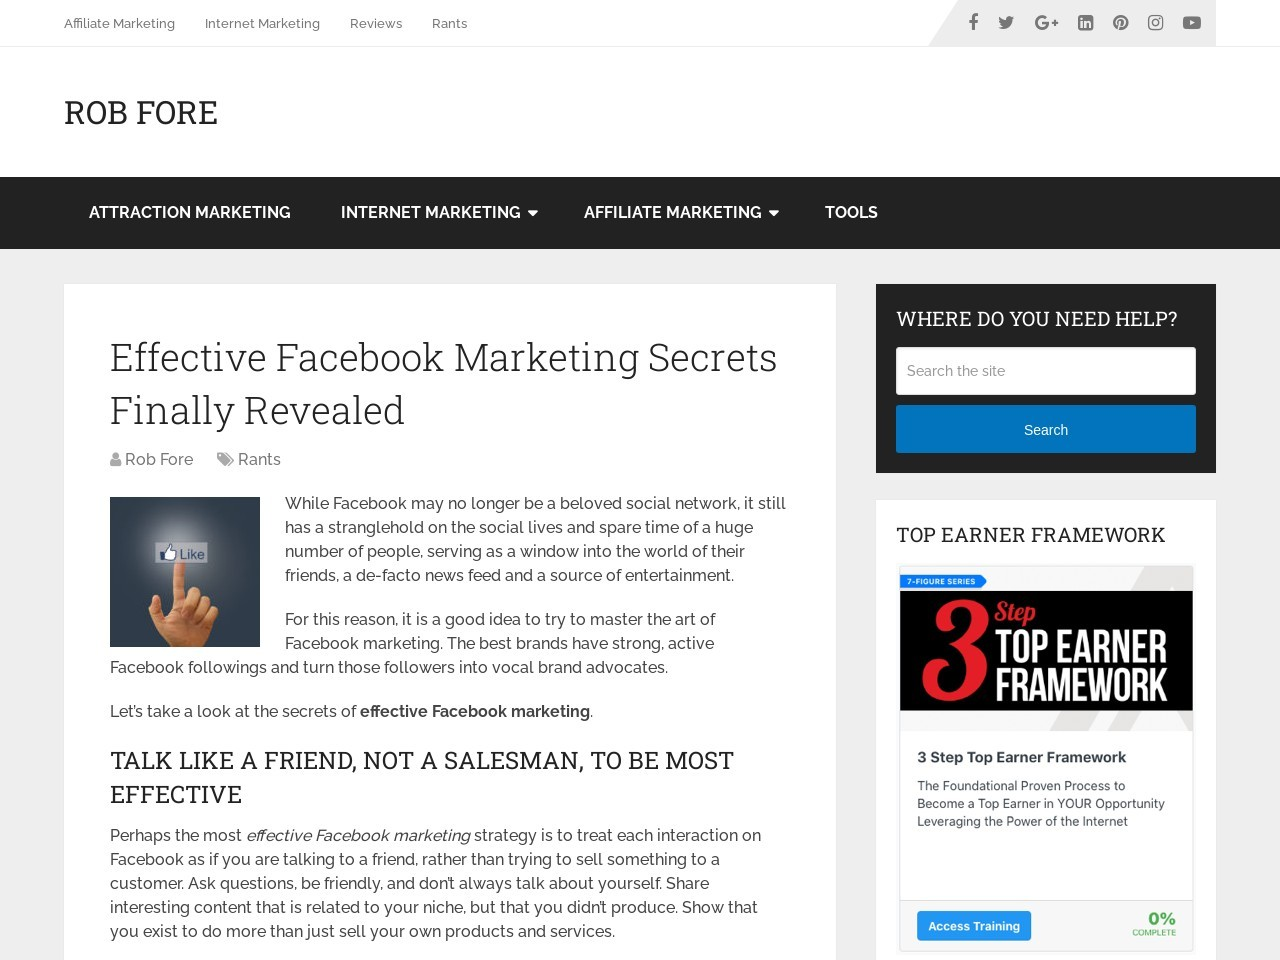 Effective Facebook Marketing Secrets Finally Revealed